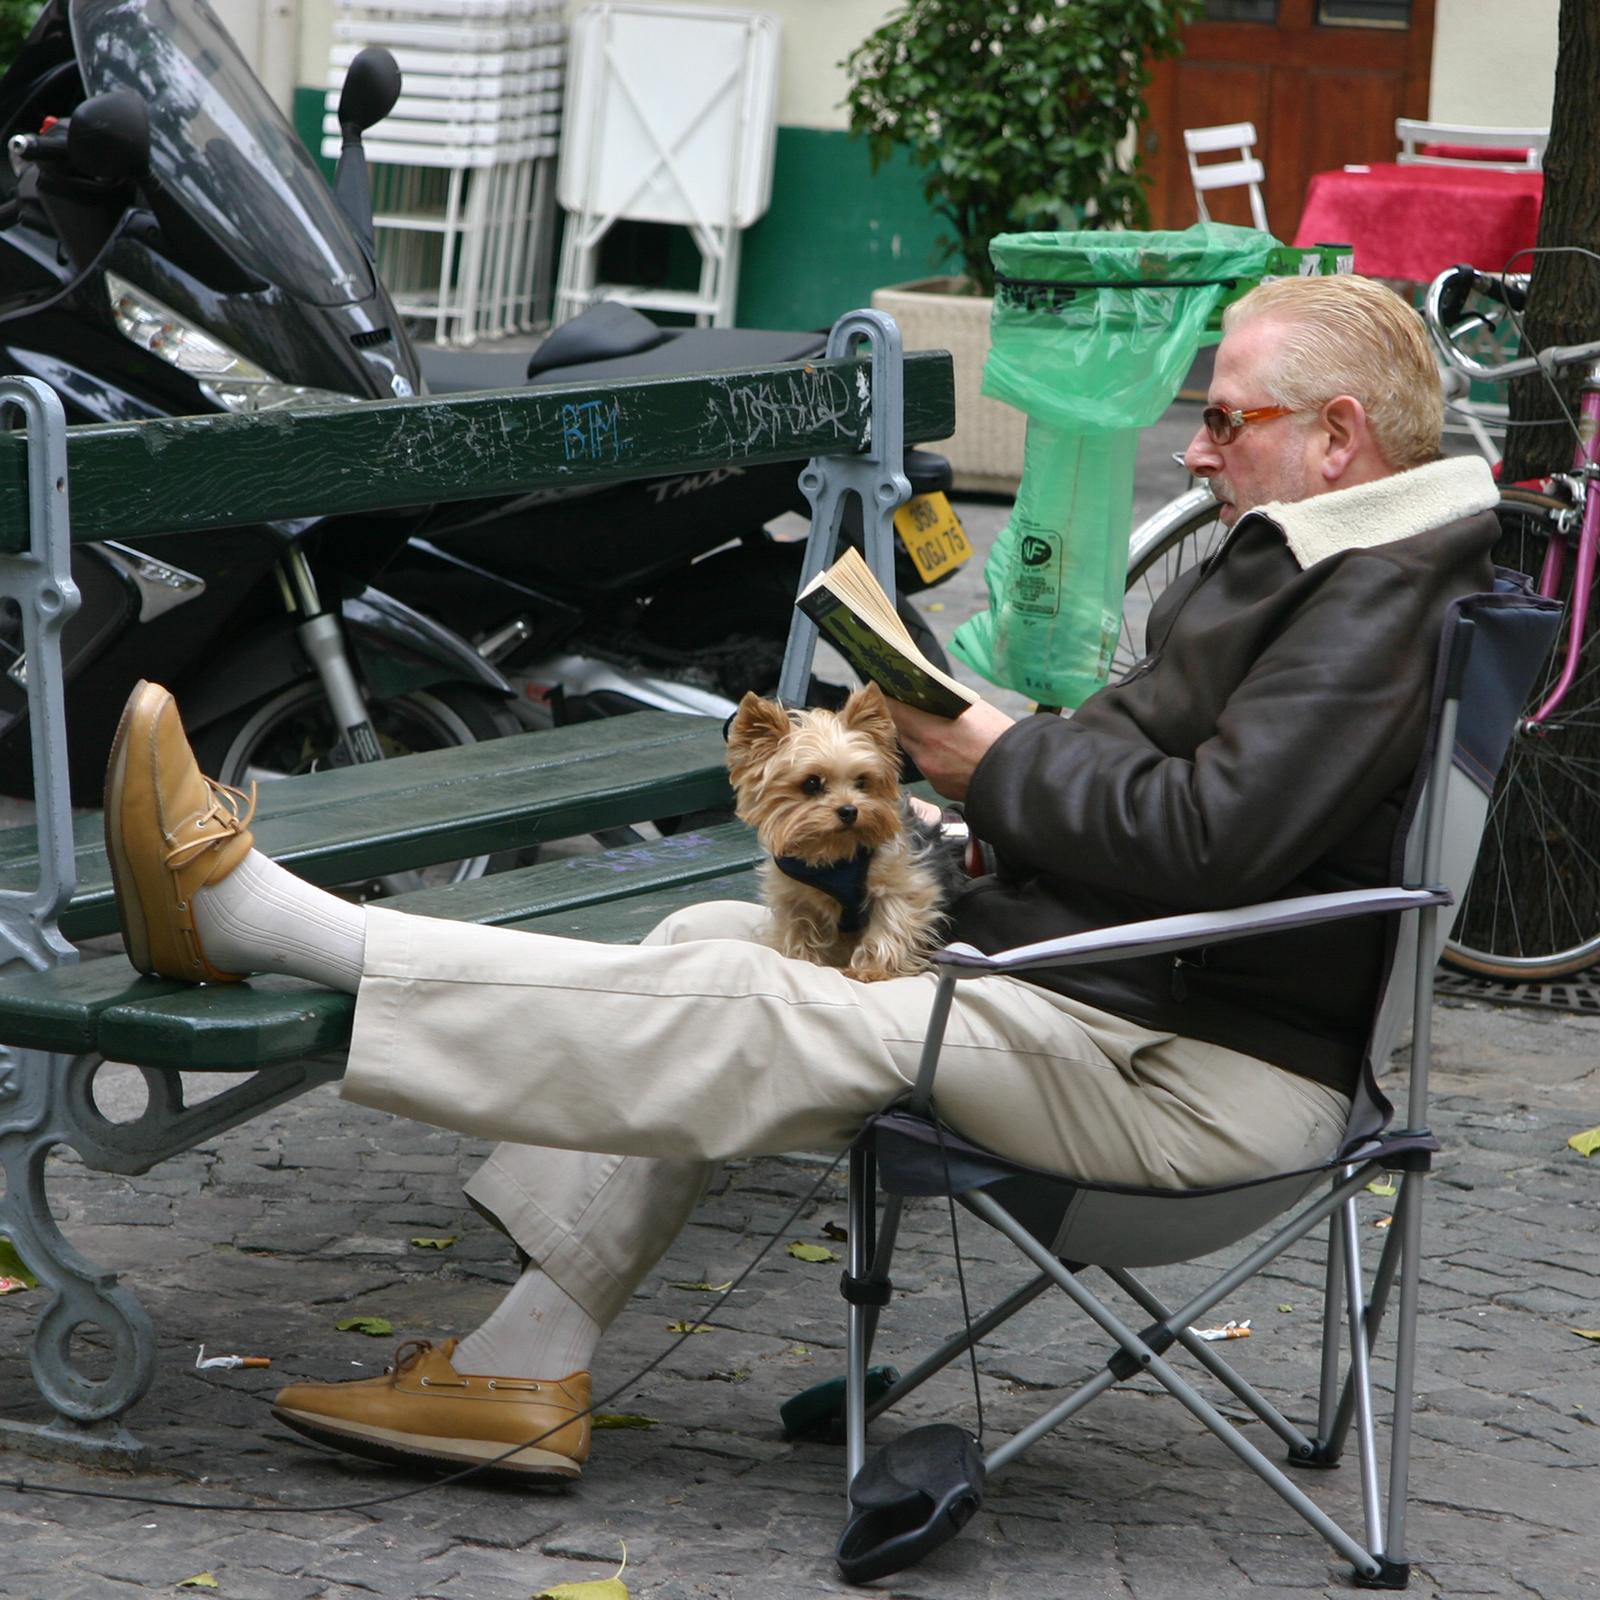 Peachy Get Into Your Comfort Zone Five Indicators Of Comfort In Cjindustries Chair Design For Home Cjindustriesco